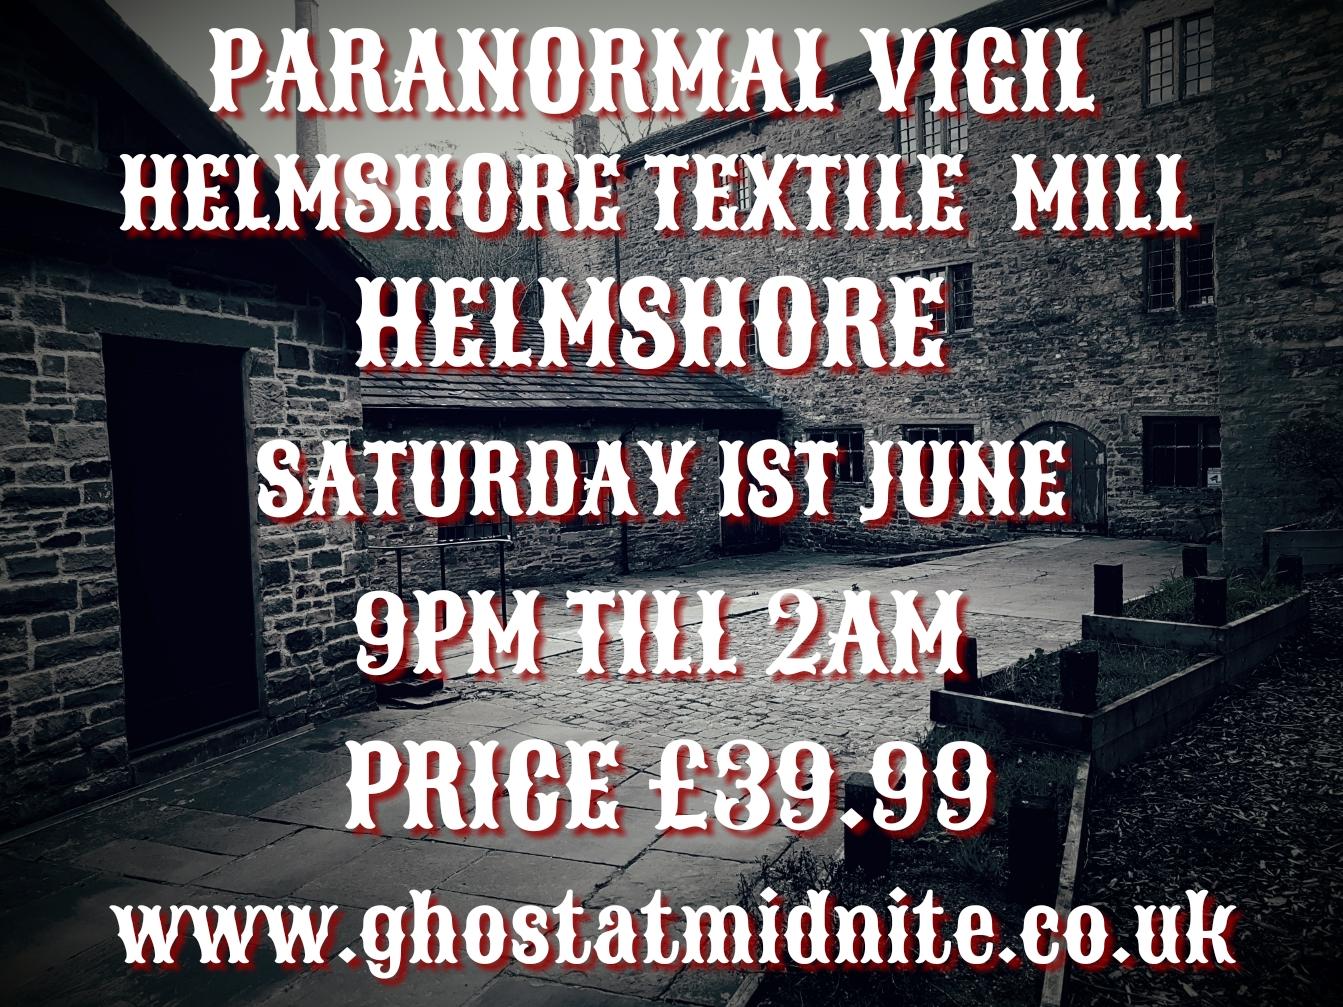 PARANORMAL VIGIL , HELMSHORE TEXTILE MILL,HELMSHORE, SATURDAY 1ST JUNE,£39.99